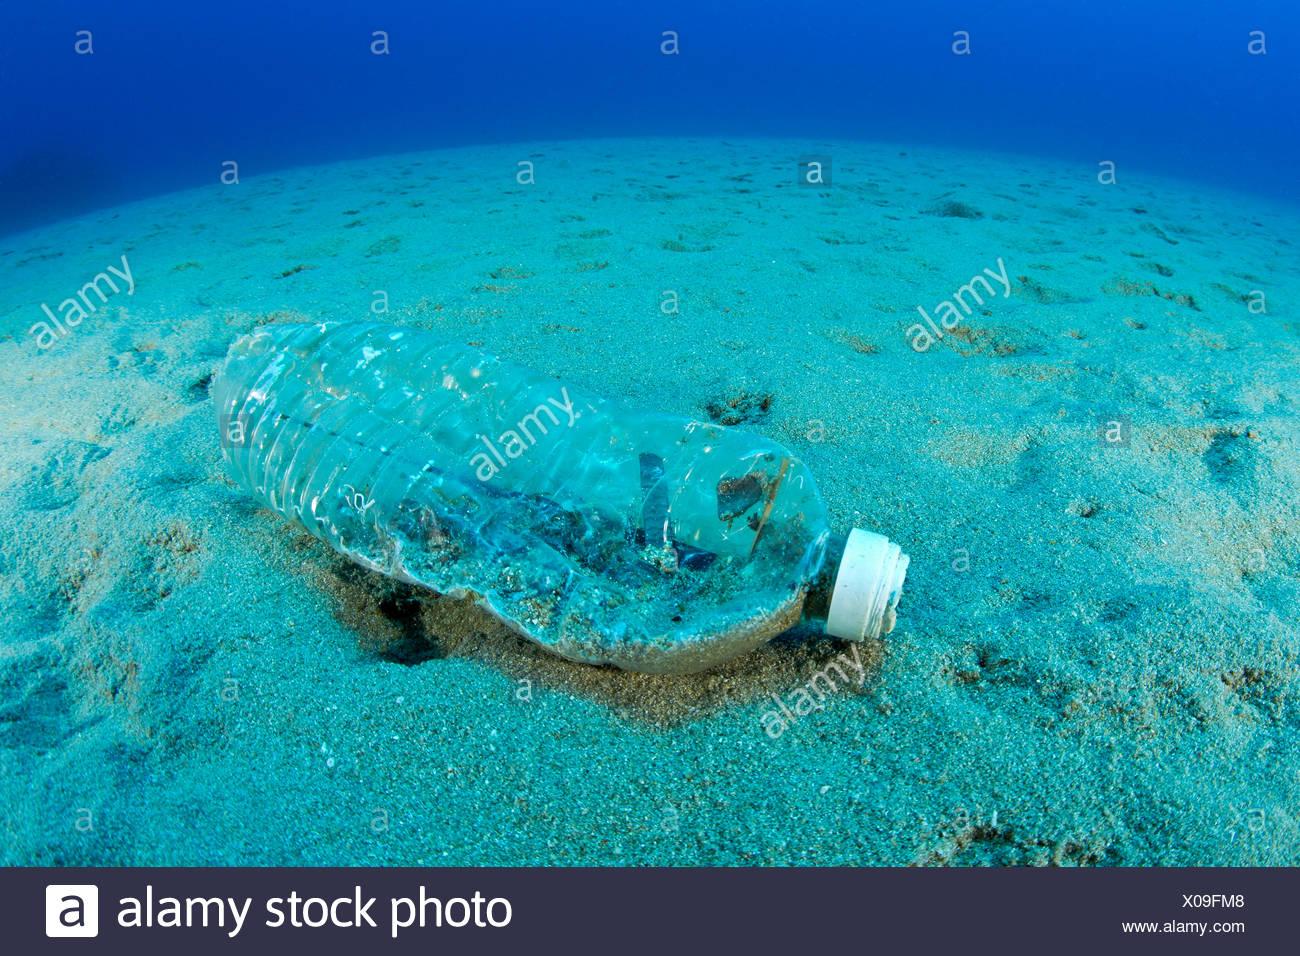 Plastic Bottle on Sea Floor, Ponza, Italy - Stock Image